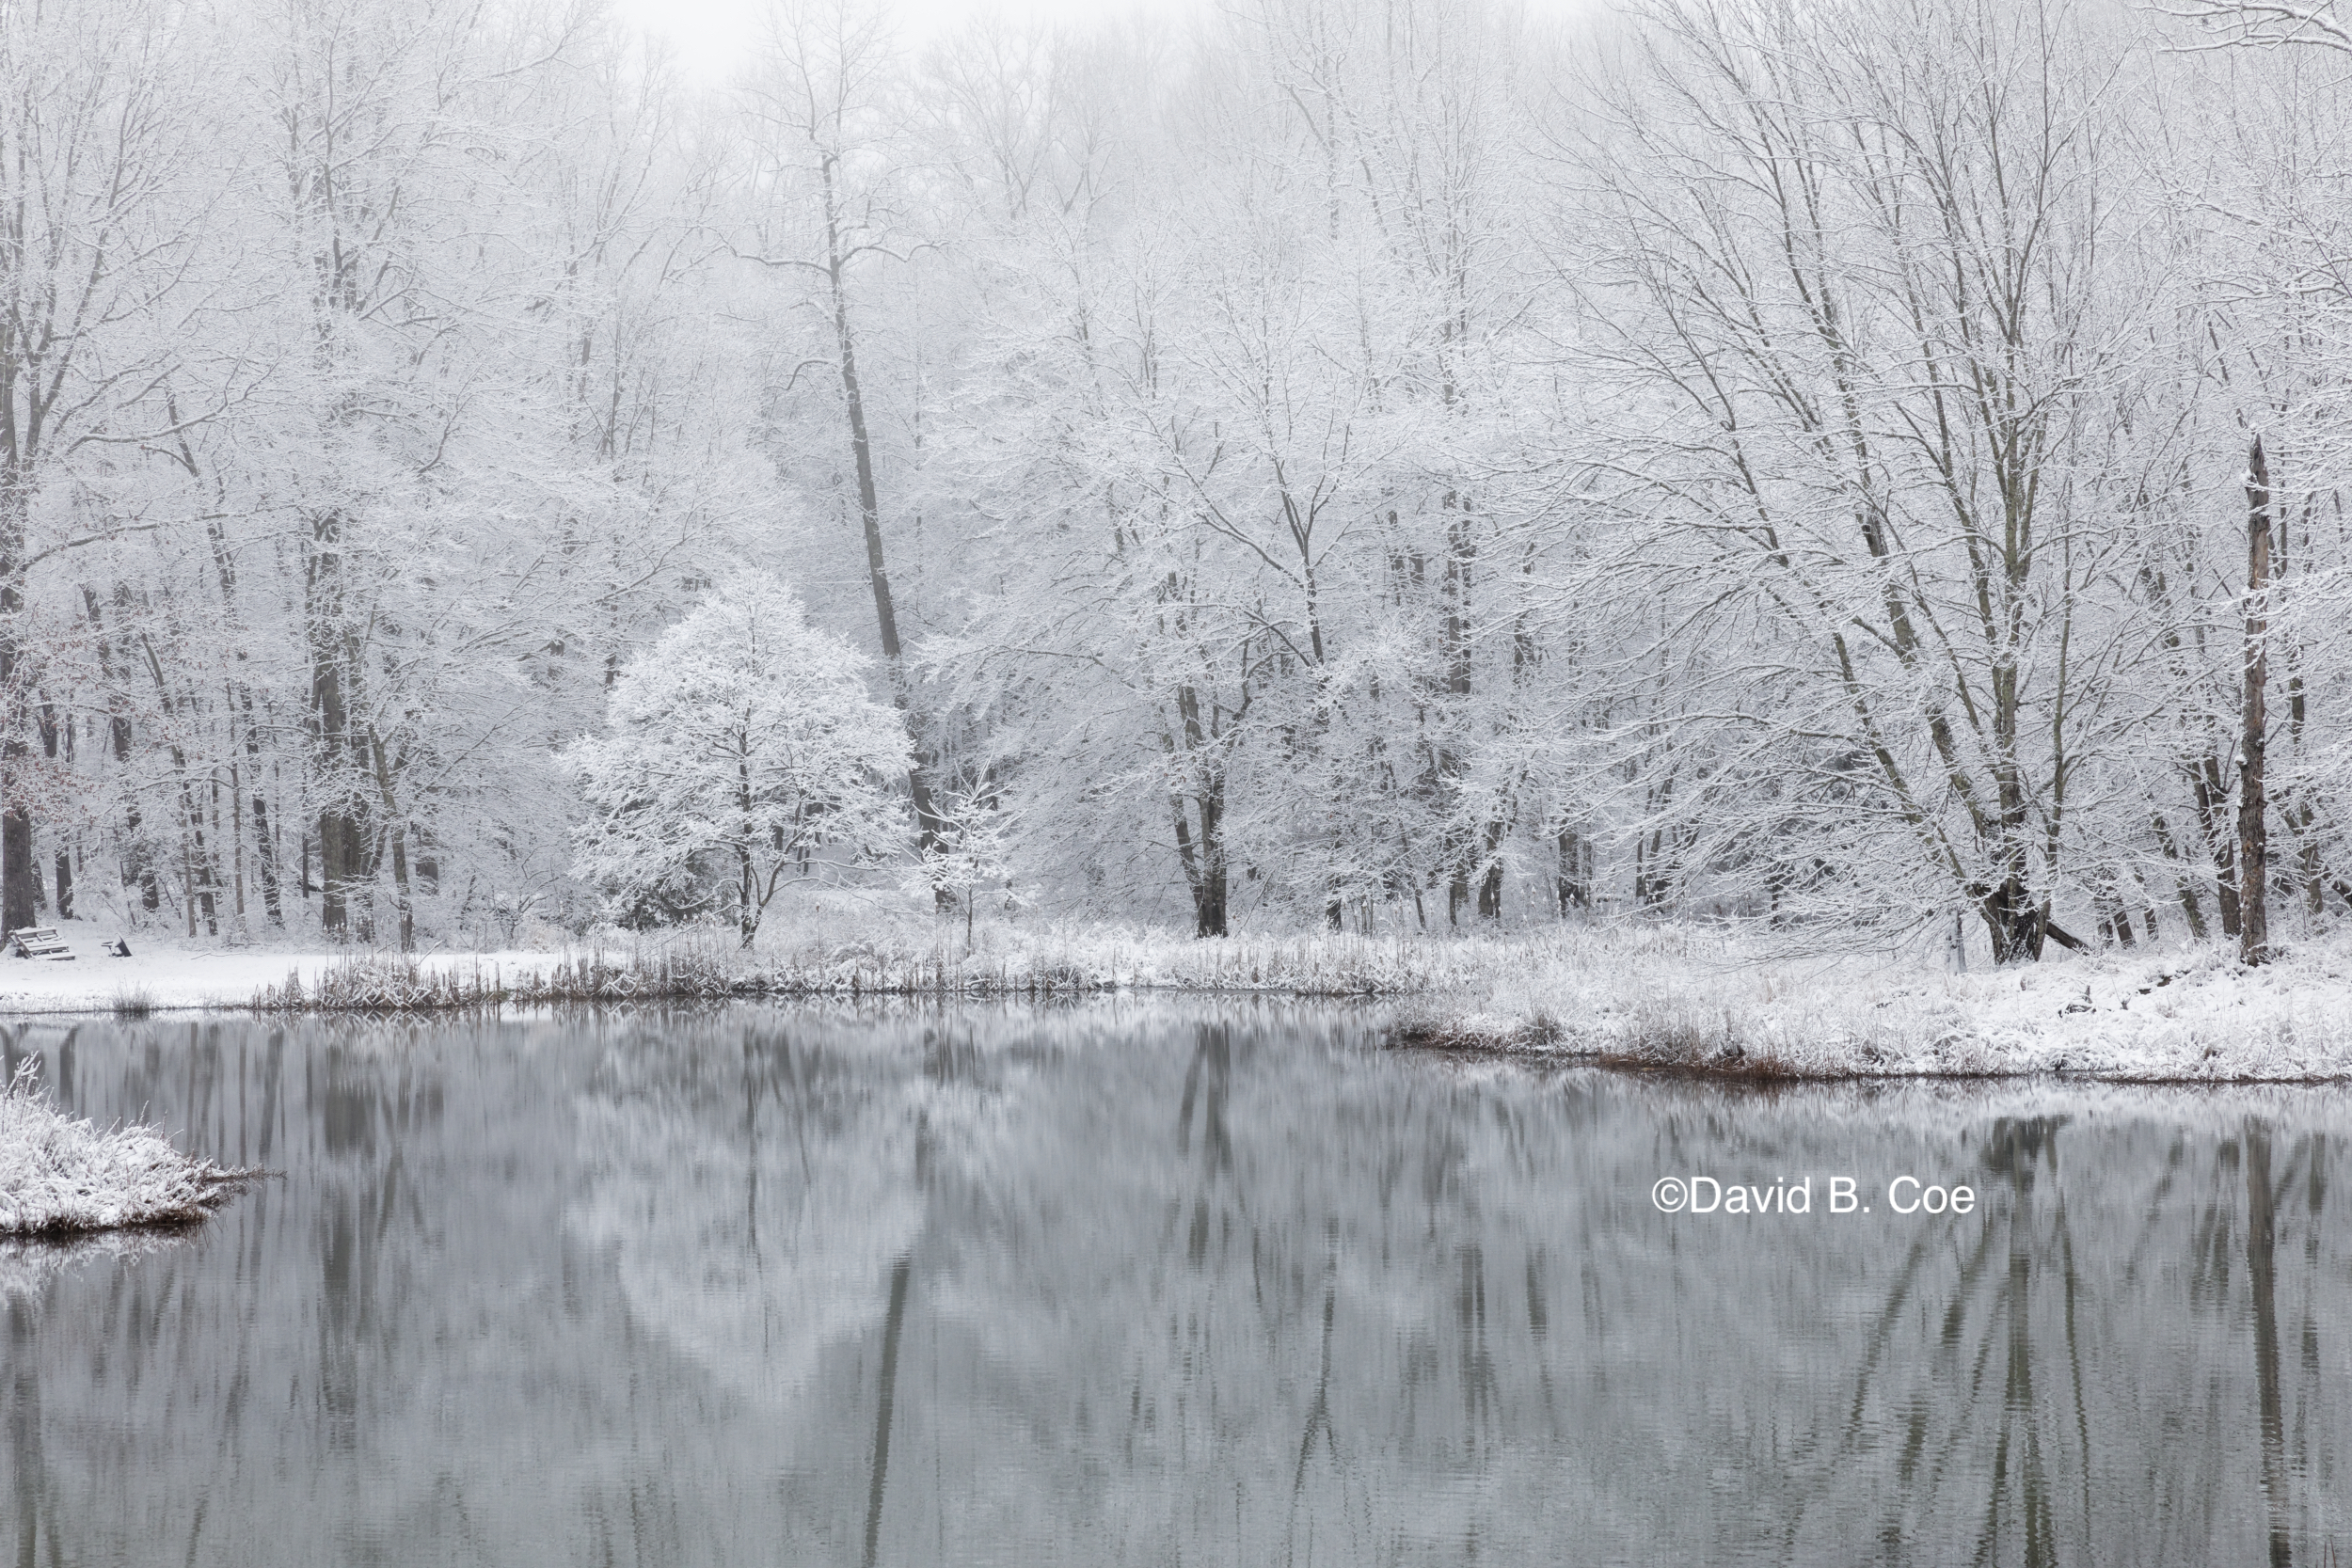 Winter Reflections, by David B. Coe